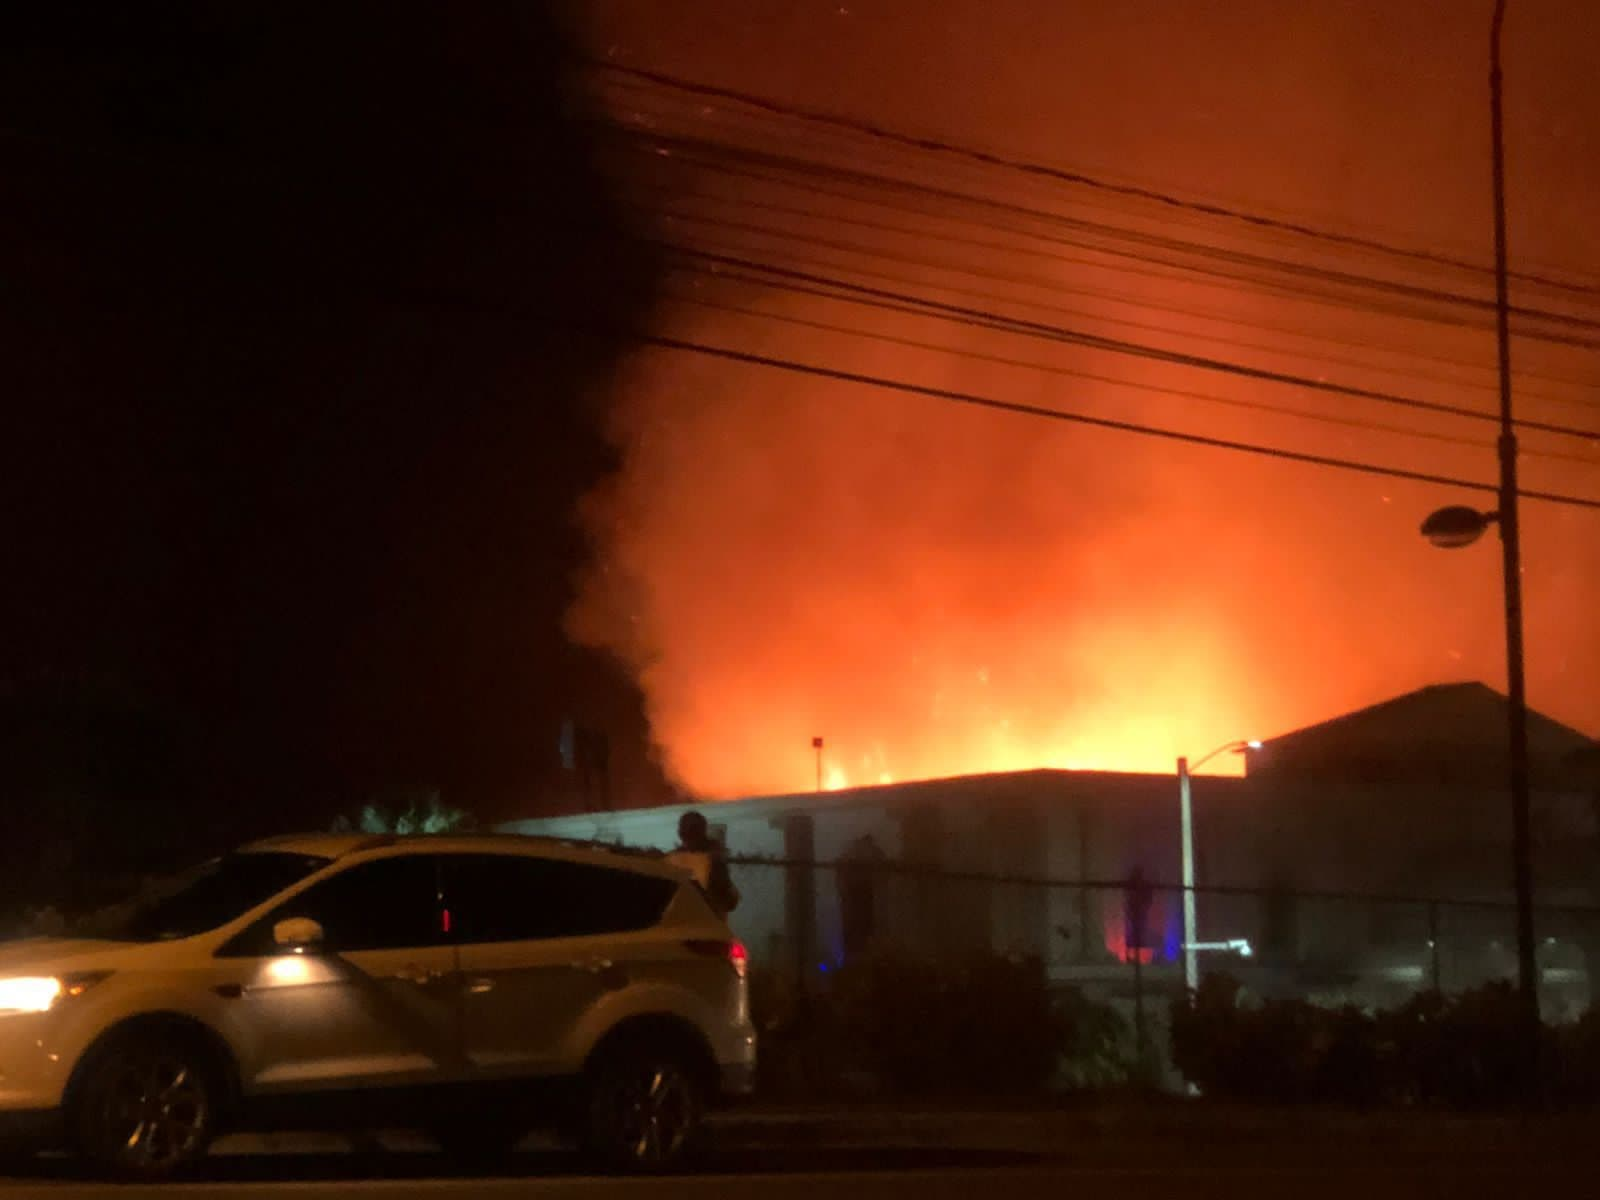 Incendio afecta hotel Iberoestar en Puerto Plata